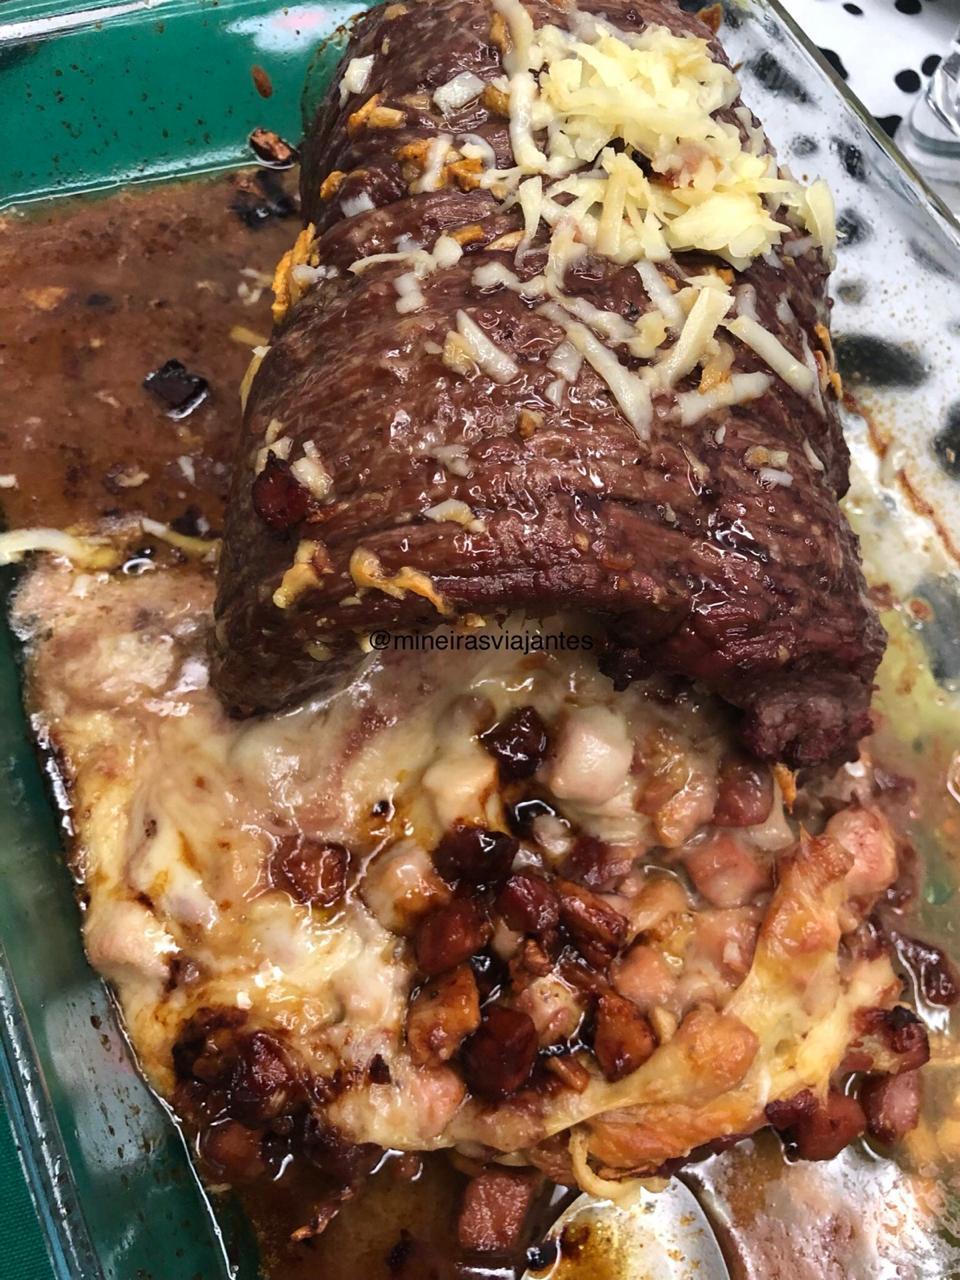 Picanha invertida com queijo e bacon